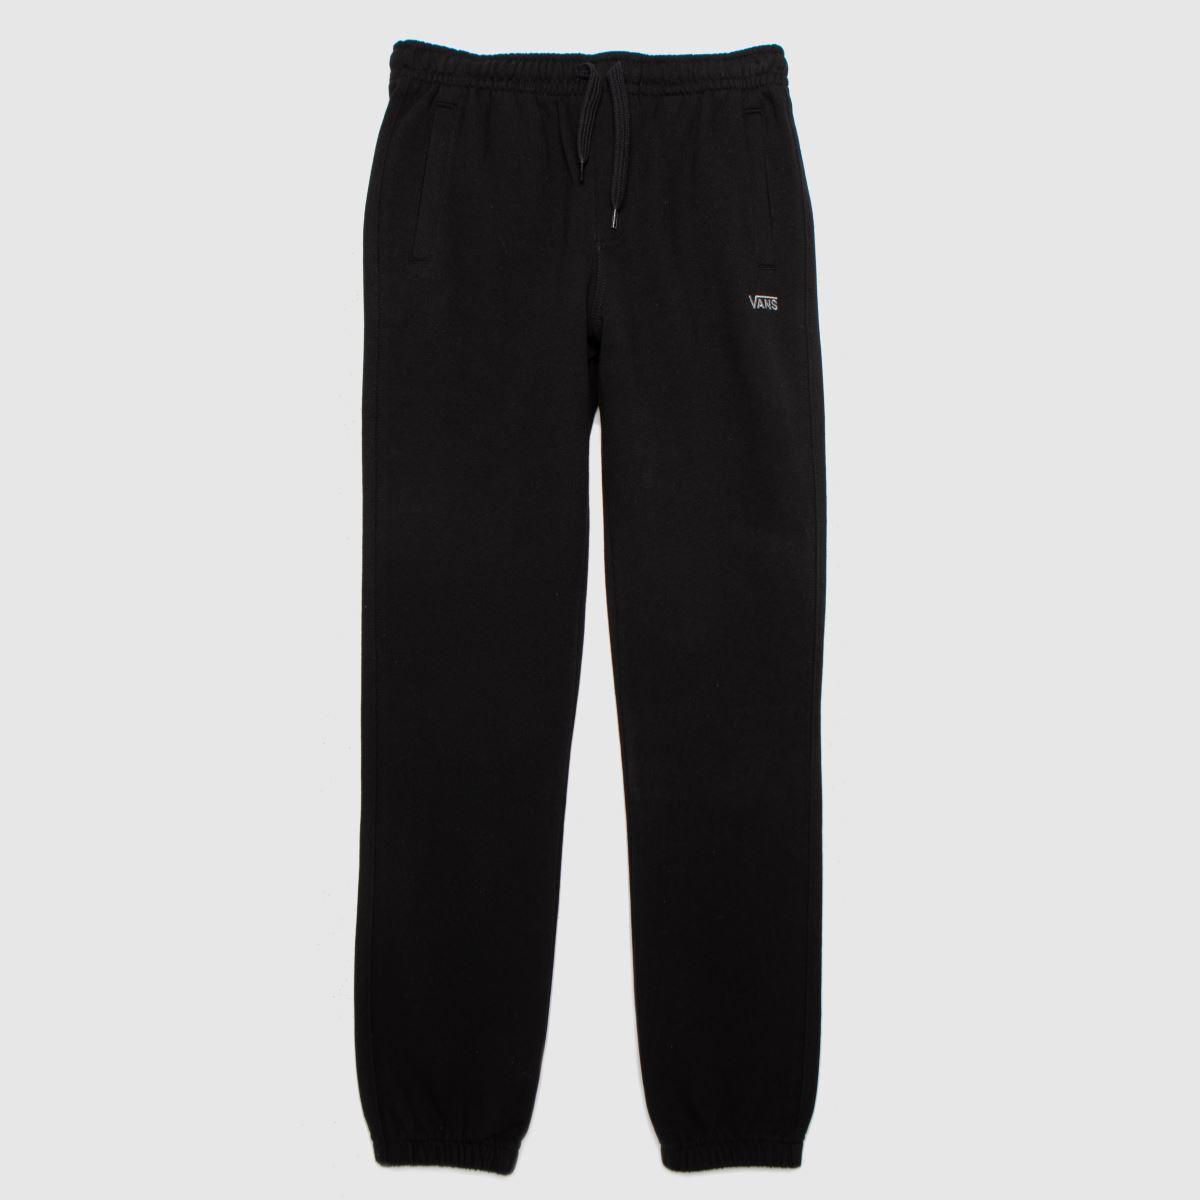 Vans Black Boys Core Fleece Pant